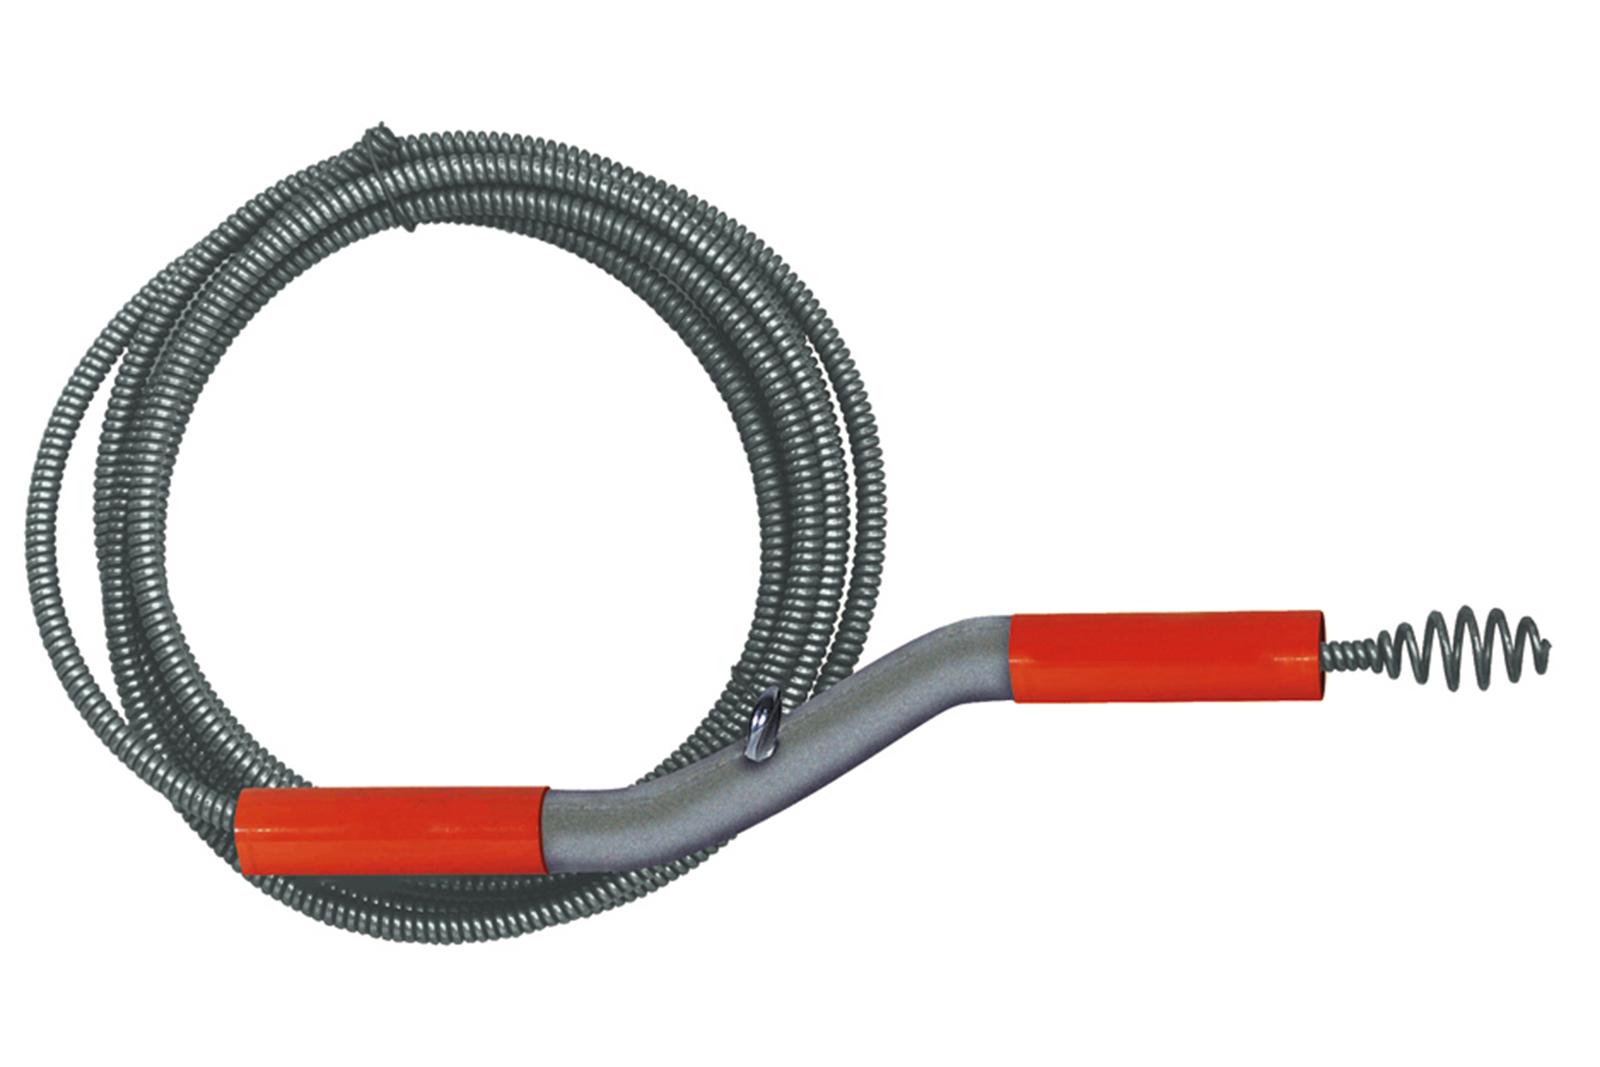 Трос для прочистки General pipe 25fl2-dh usa cvd znse focus lens dia 25 25 4mm fl 63 5mm 2 5 for co2 laser engraving cutting machine free shipping